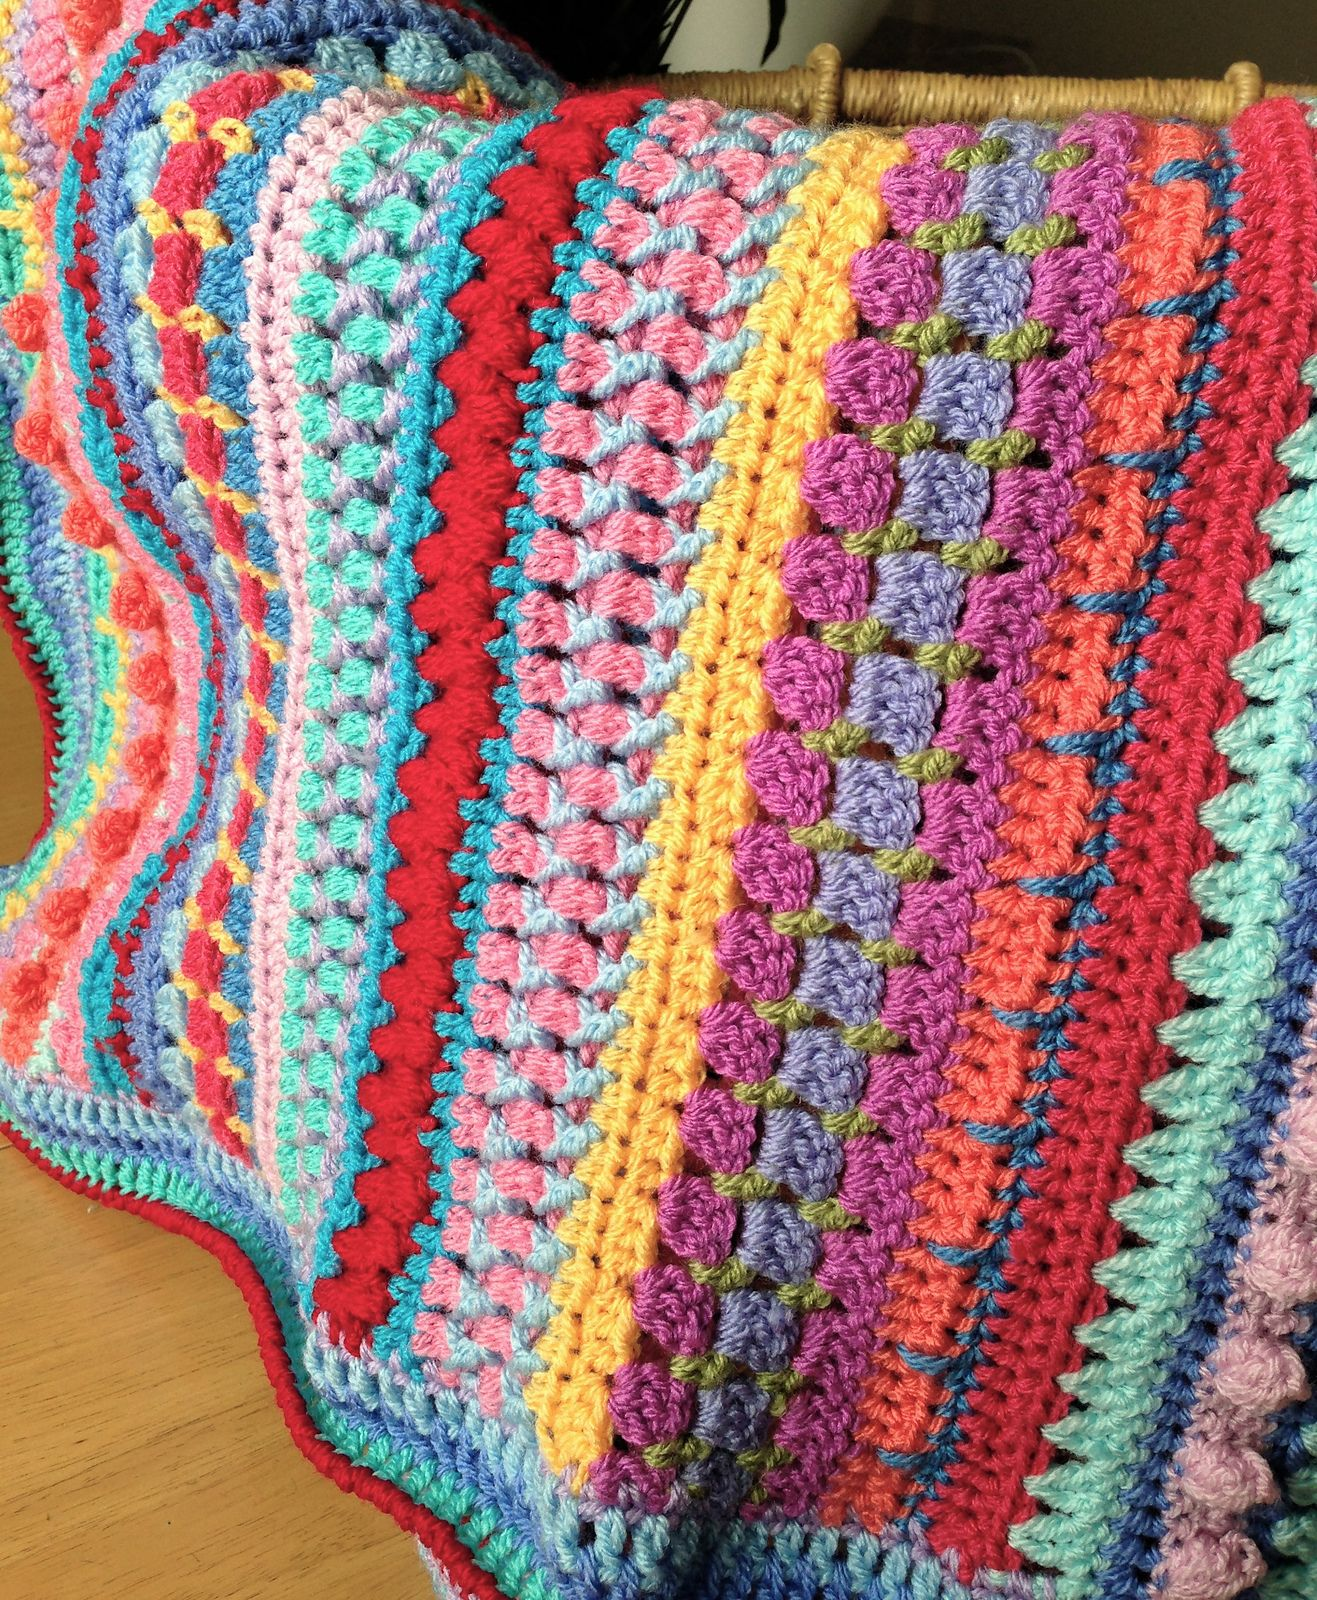 Ravelry: Multi-stitch Striped Blanket by Lynne Samaan | crochet ...